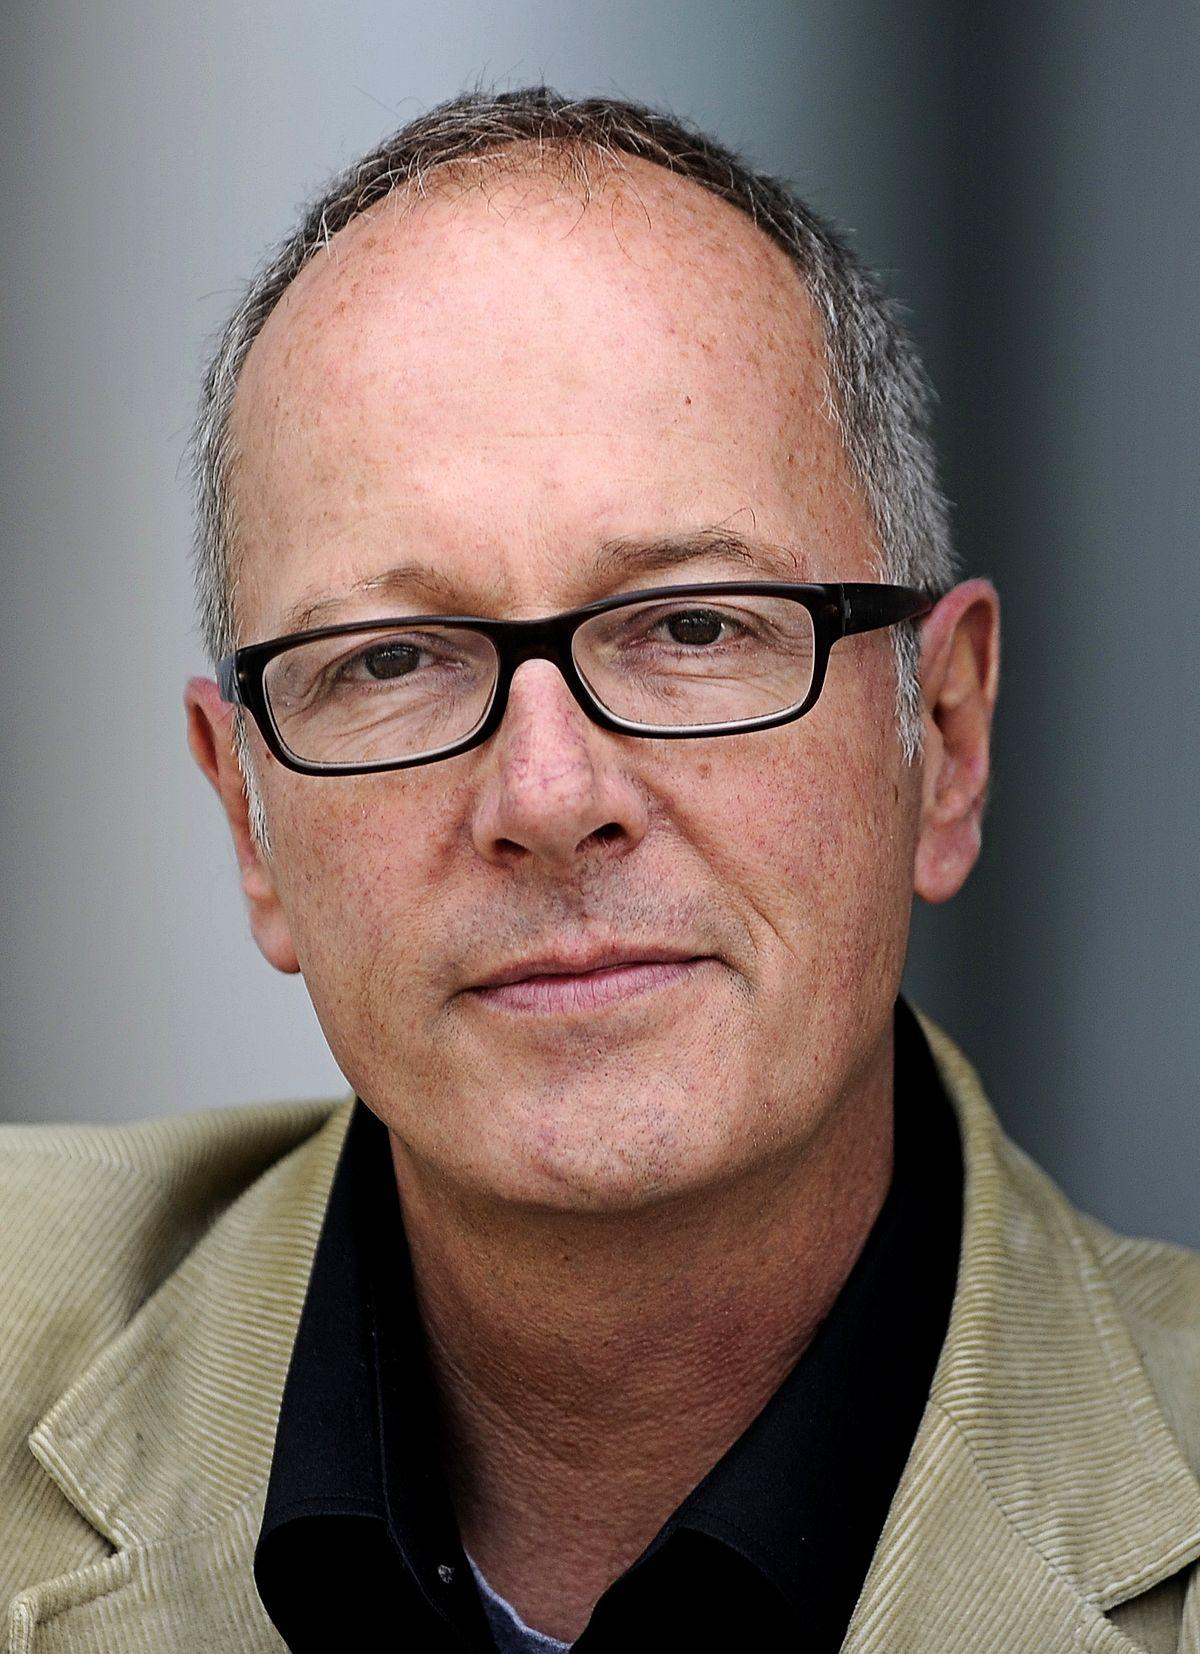 Andreas Föhr